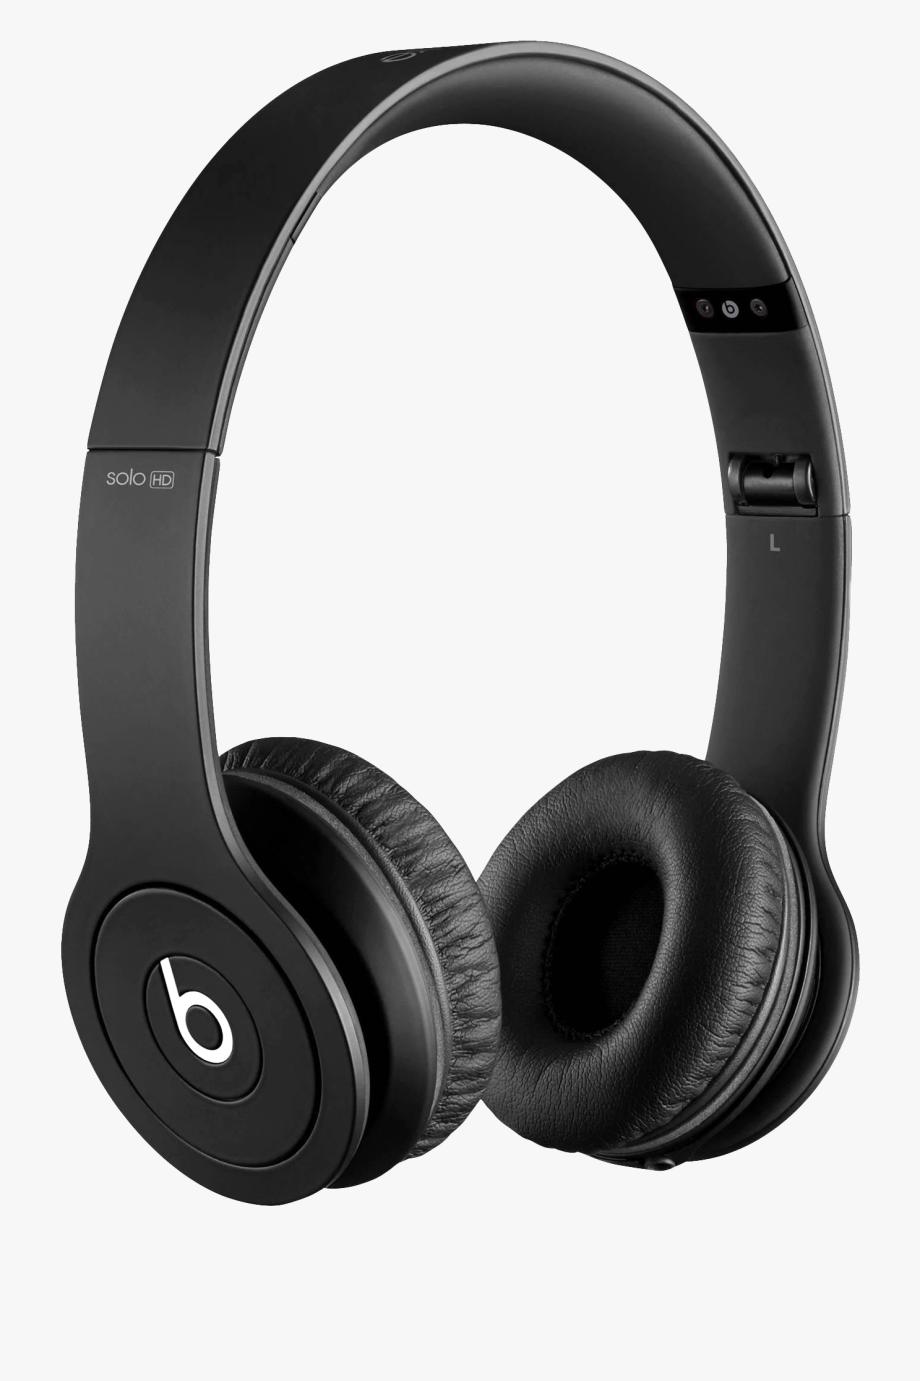 Headphone clipart headphone beats. Cool red solo hd